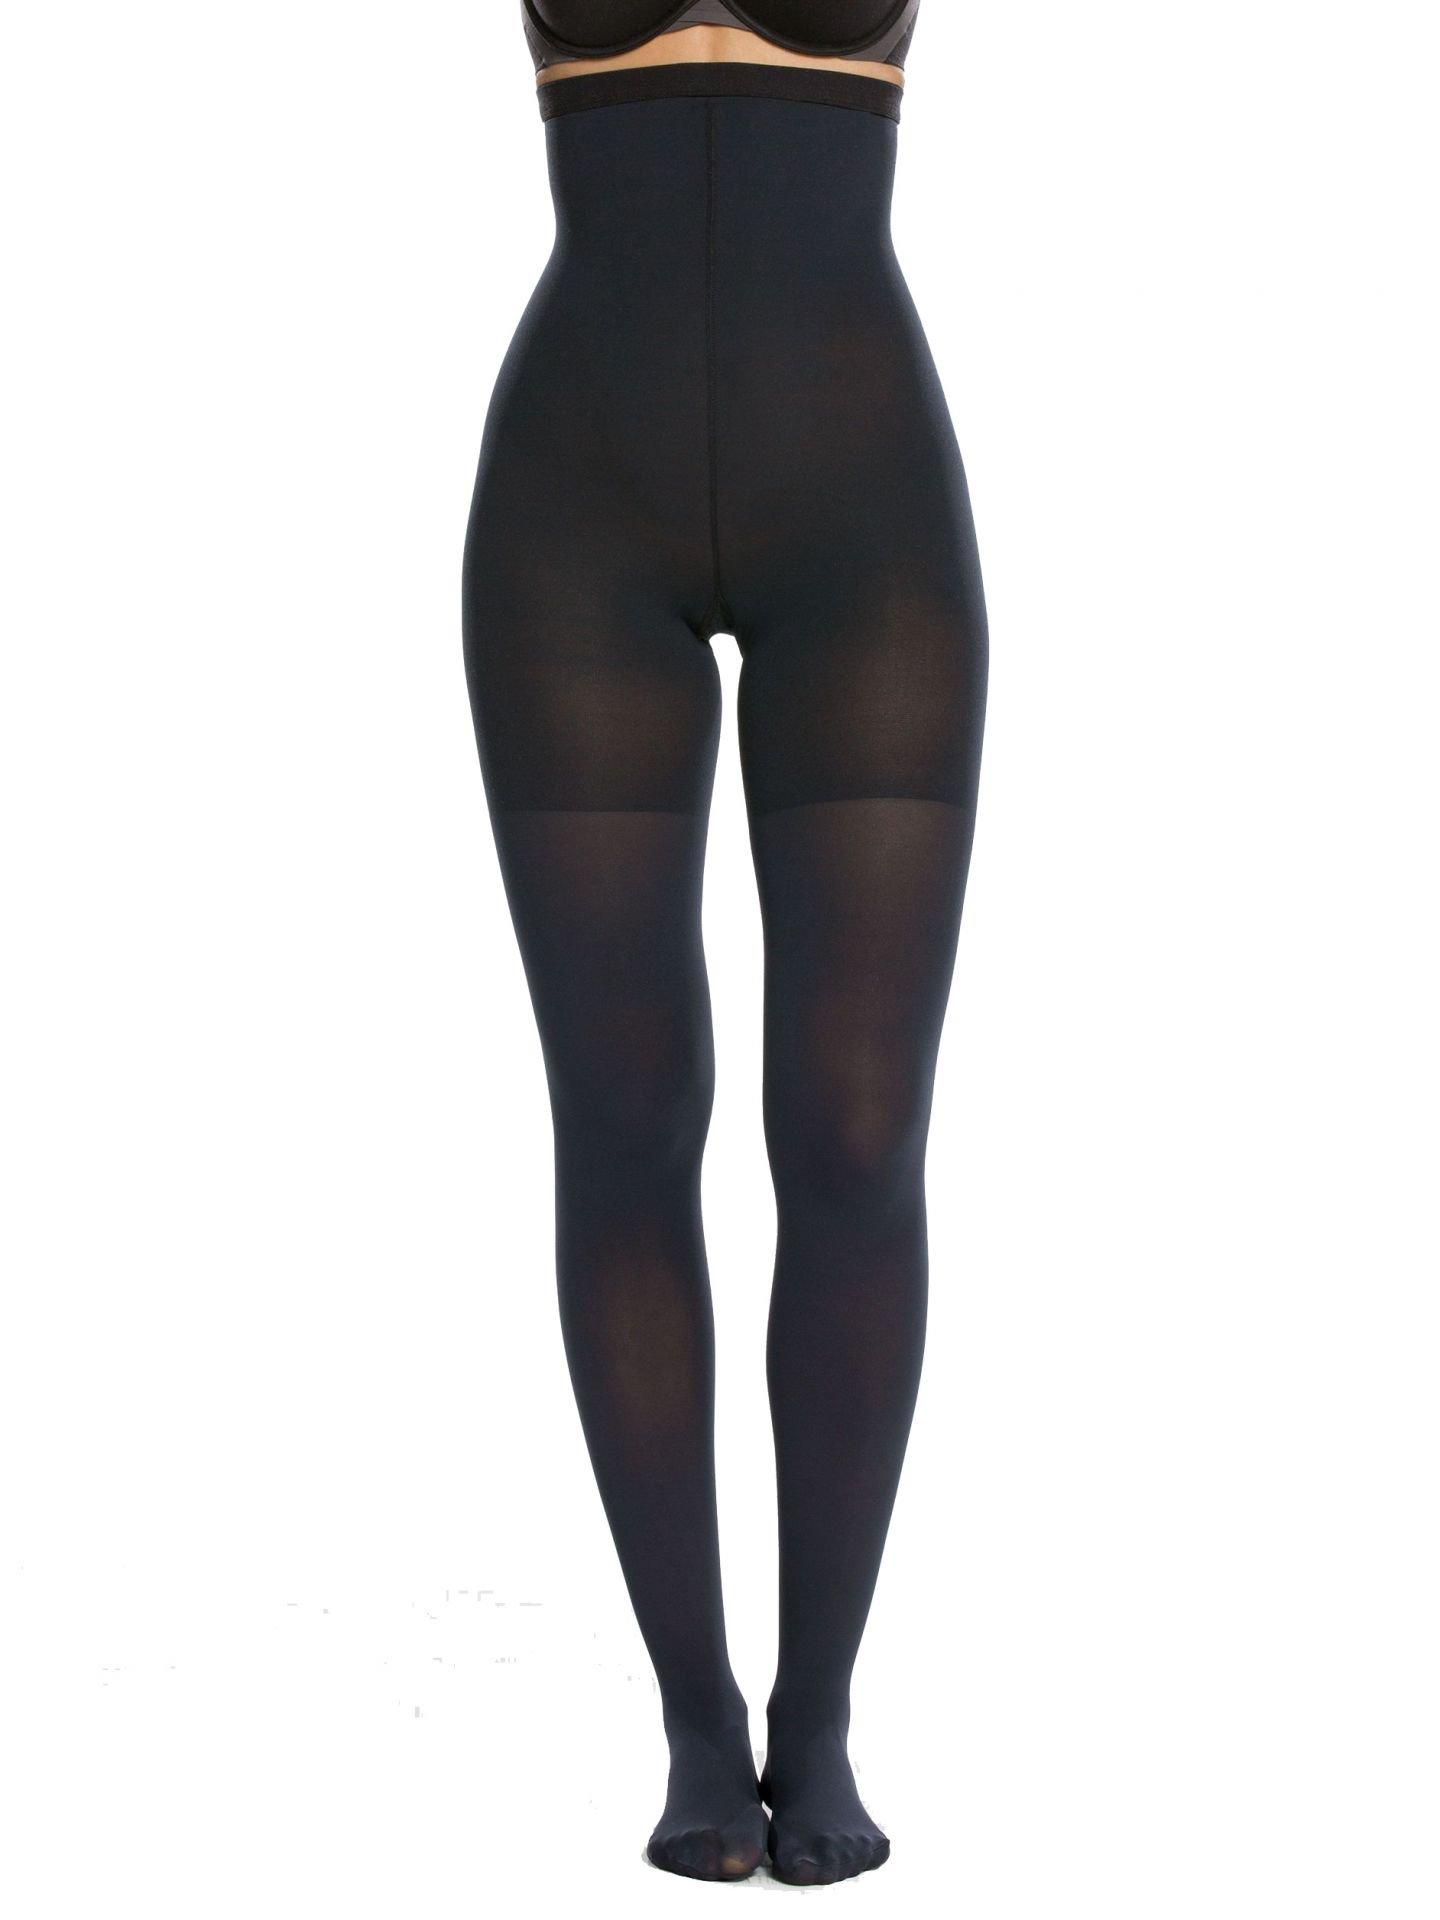 SPANX Luxe Leg High Waist Tights, C, Night Navy